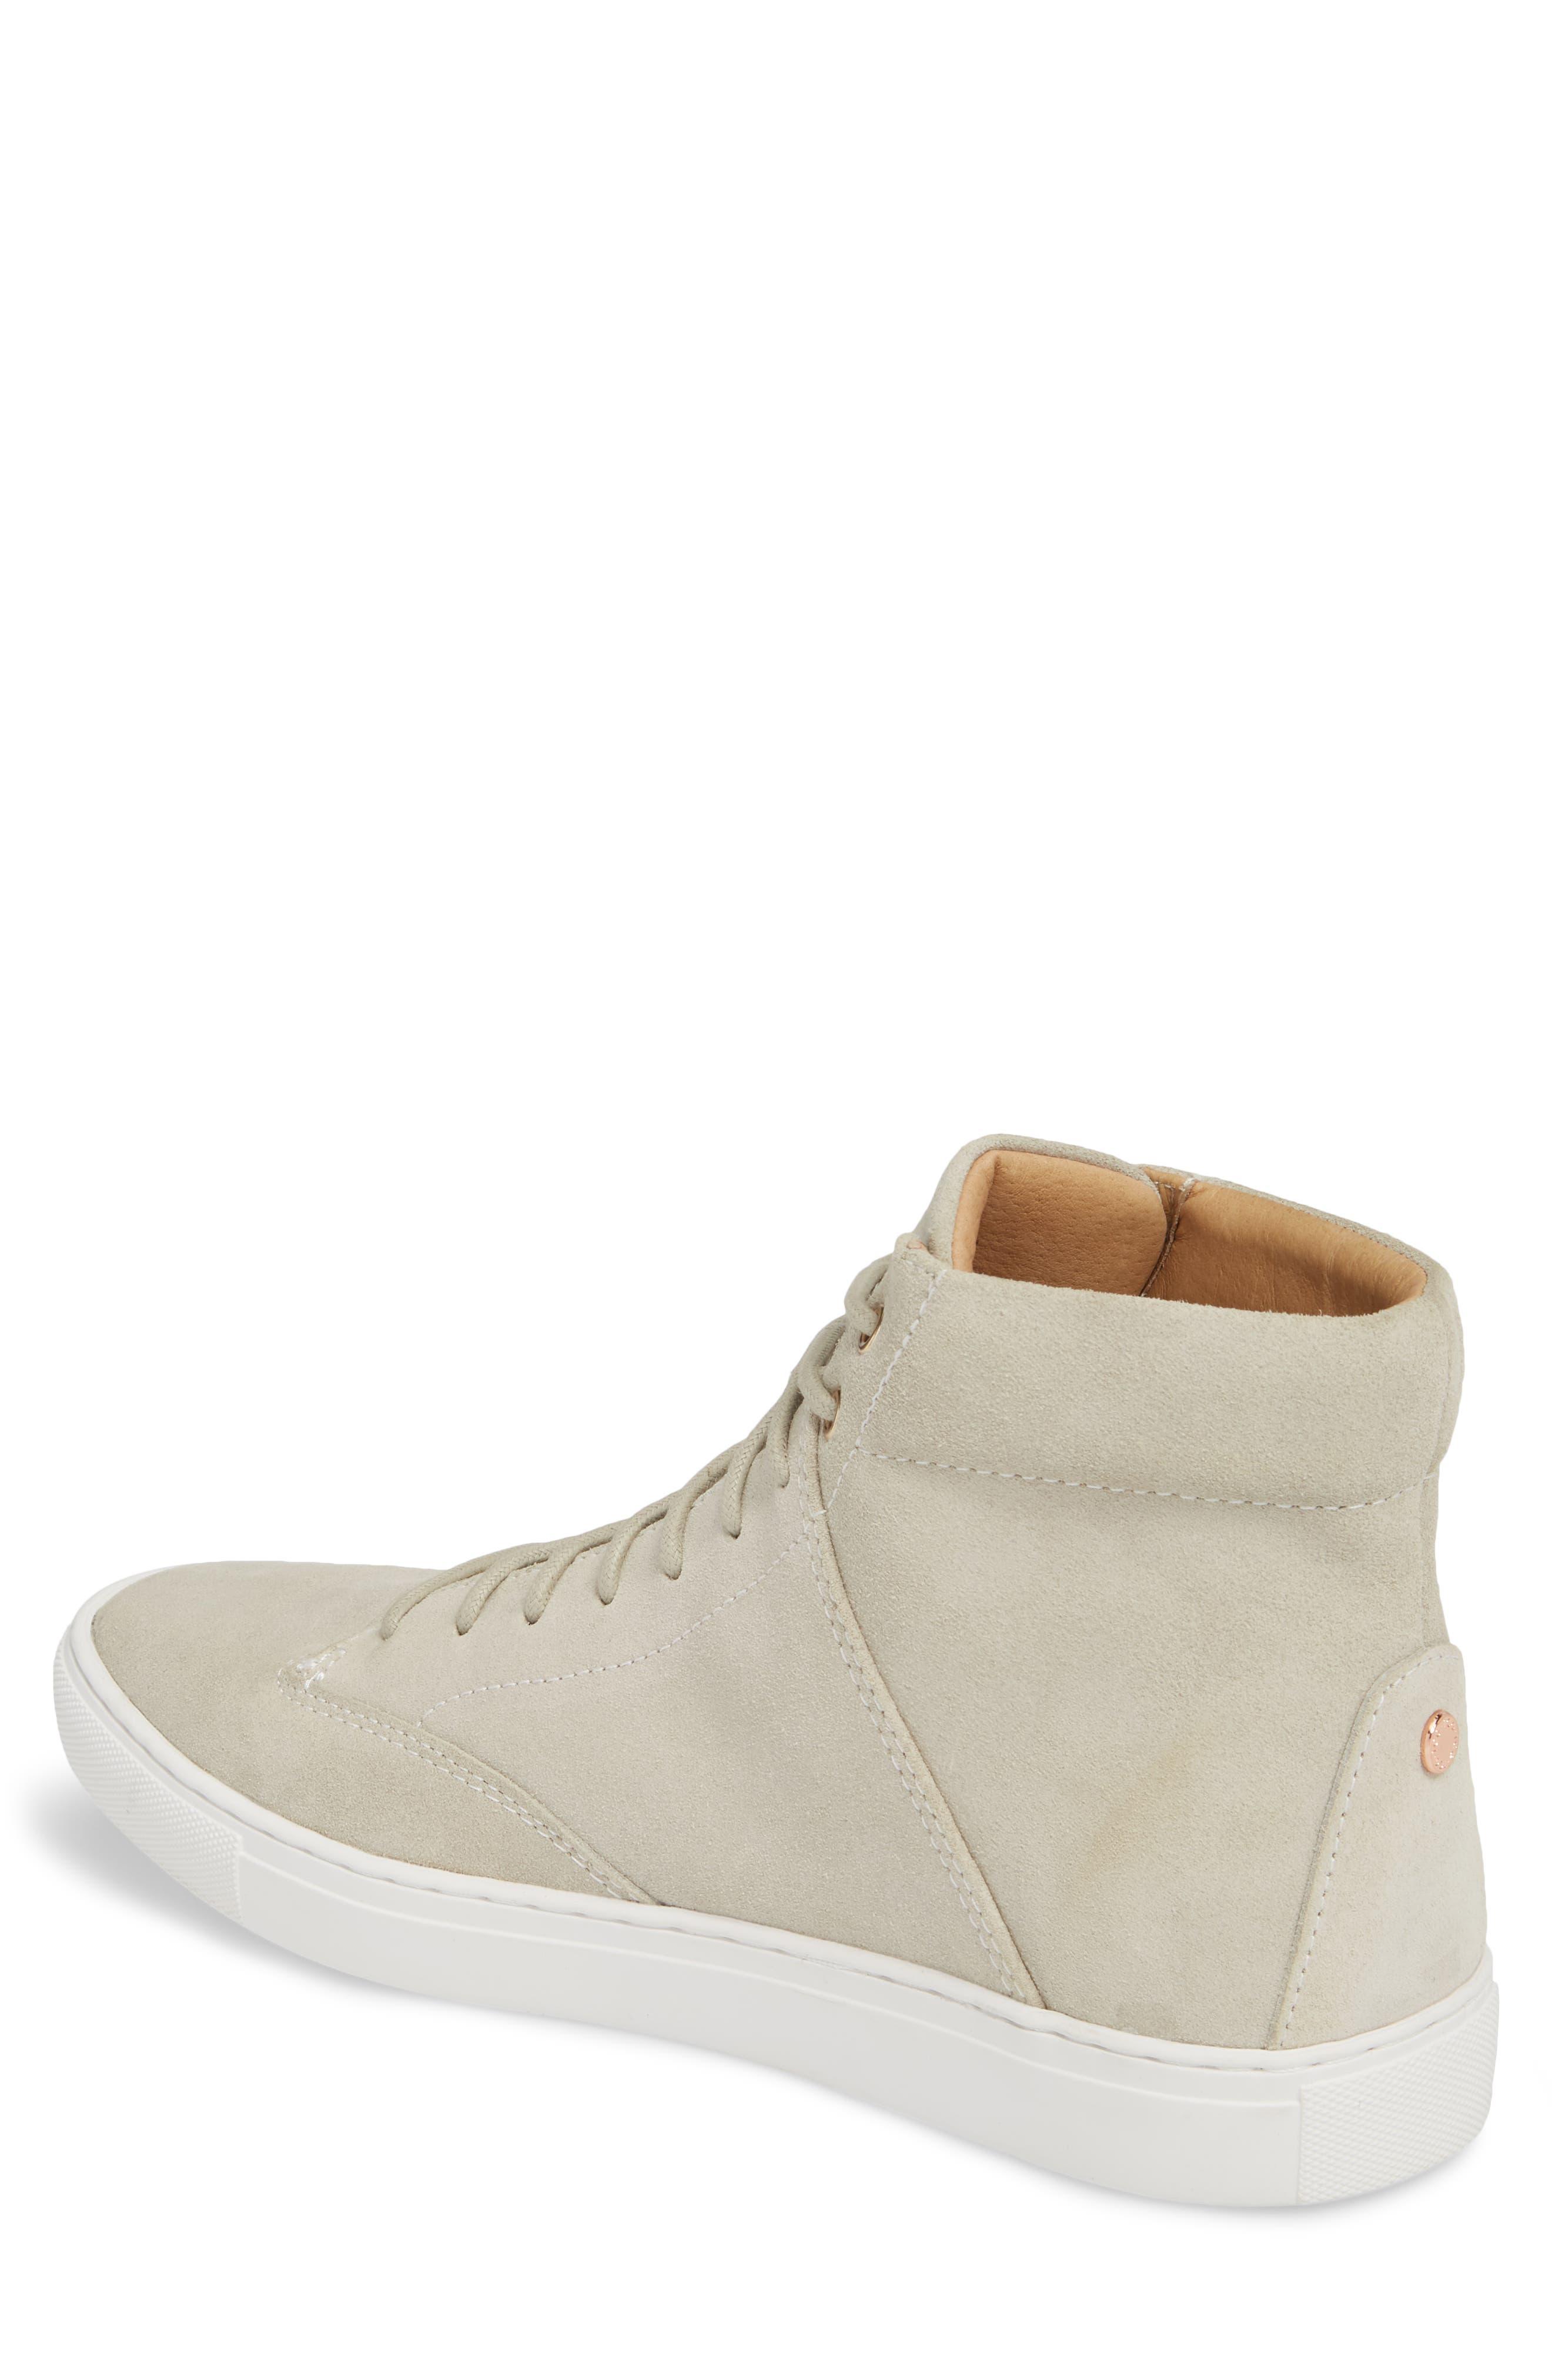 'Porter' High Top Sneaker,                             Alternate thumbnail 2, color,                             Quartz Leather